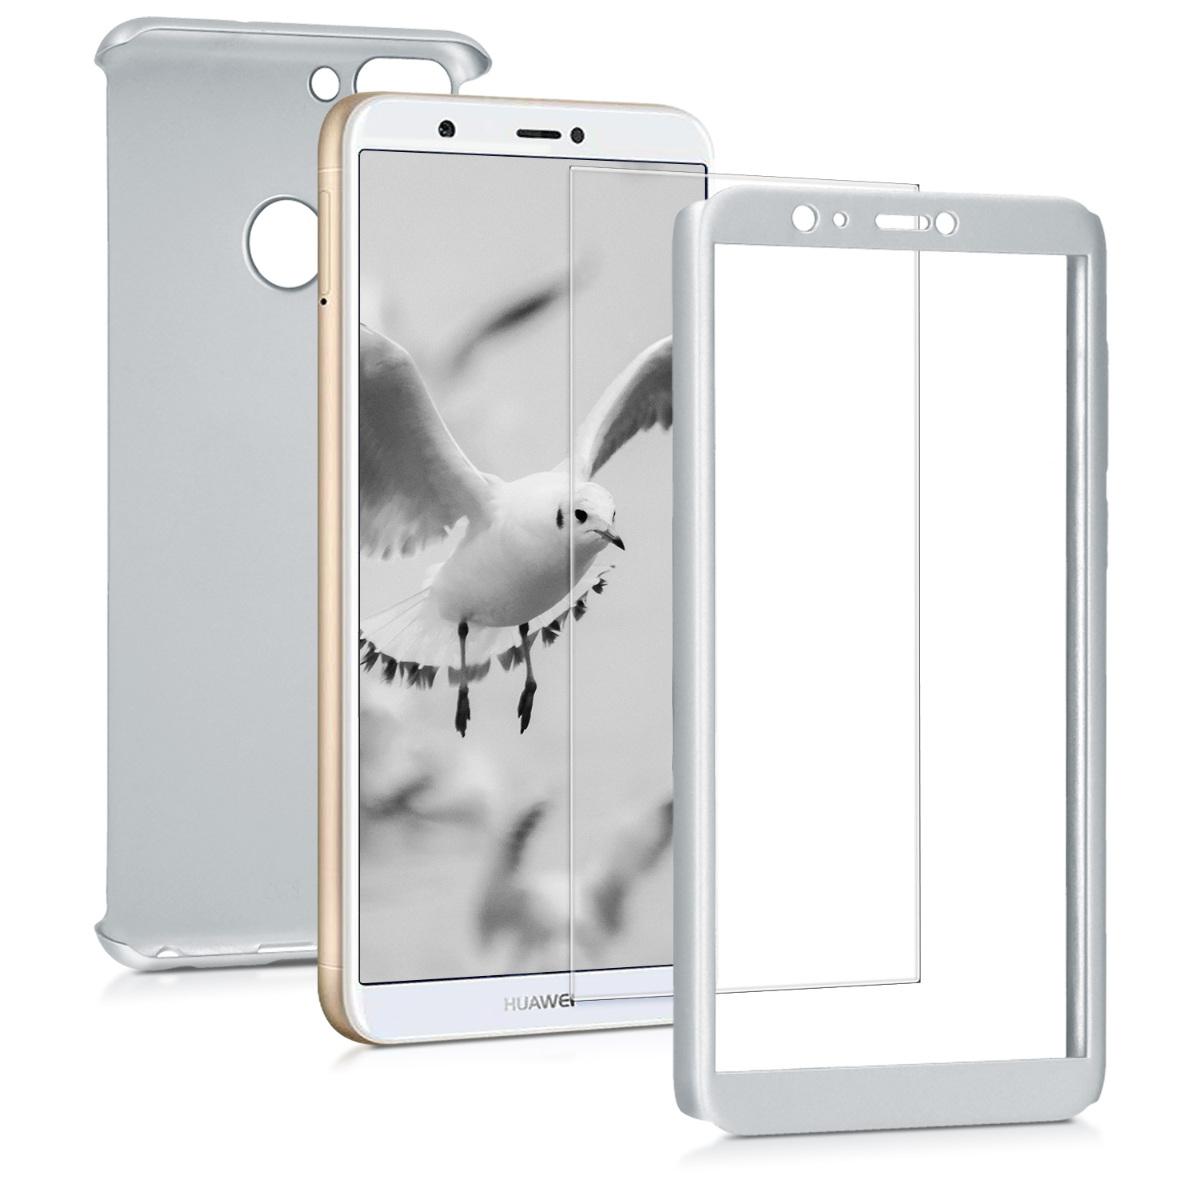 KW Θήκη Full Body Huawei Enjoy 7S / P Smart & Tempered Glass - Metallic Silver (45559.67)